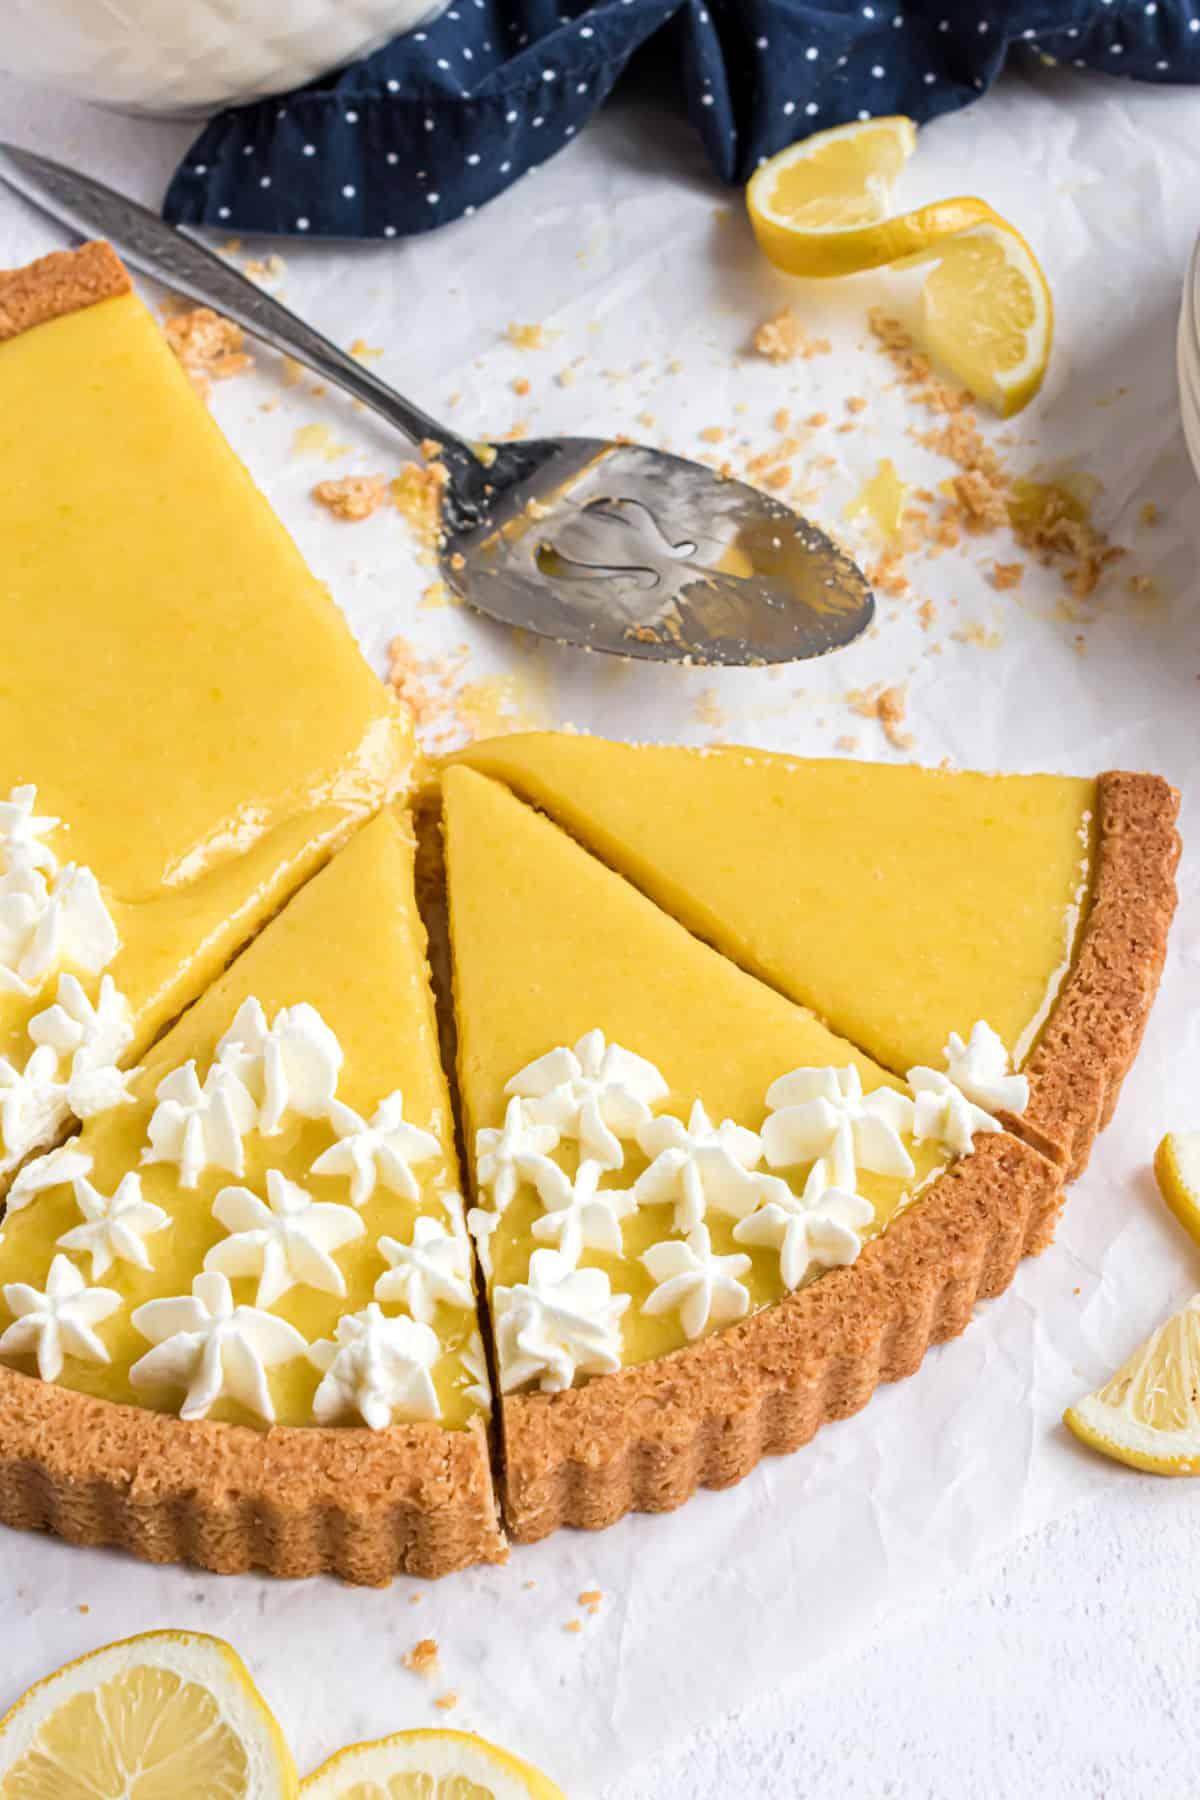 Sliced lemon tart with a golden crust.